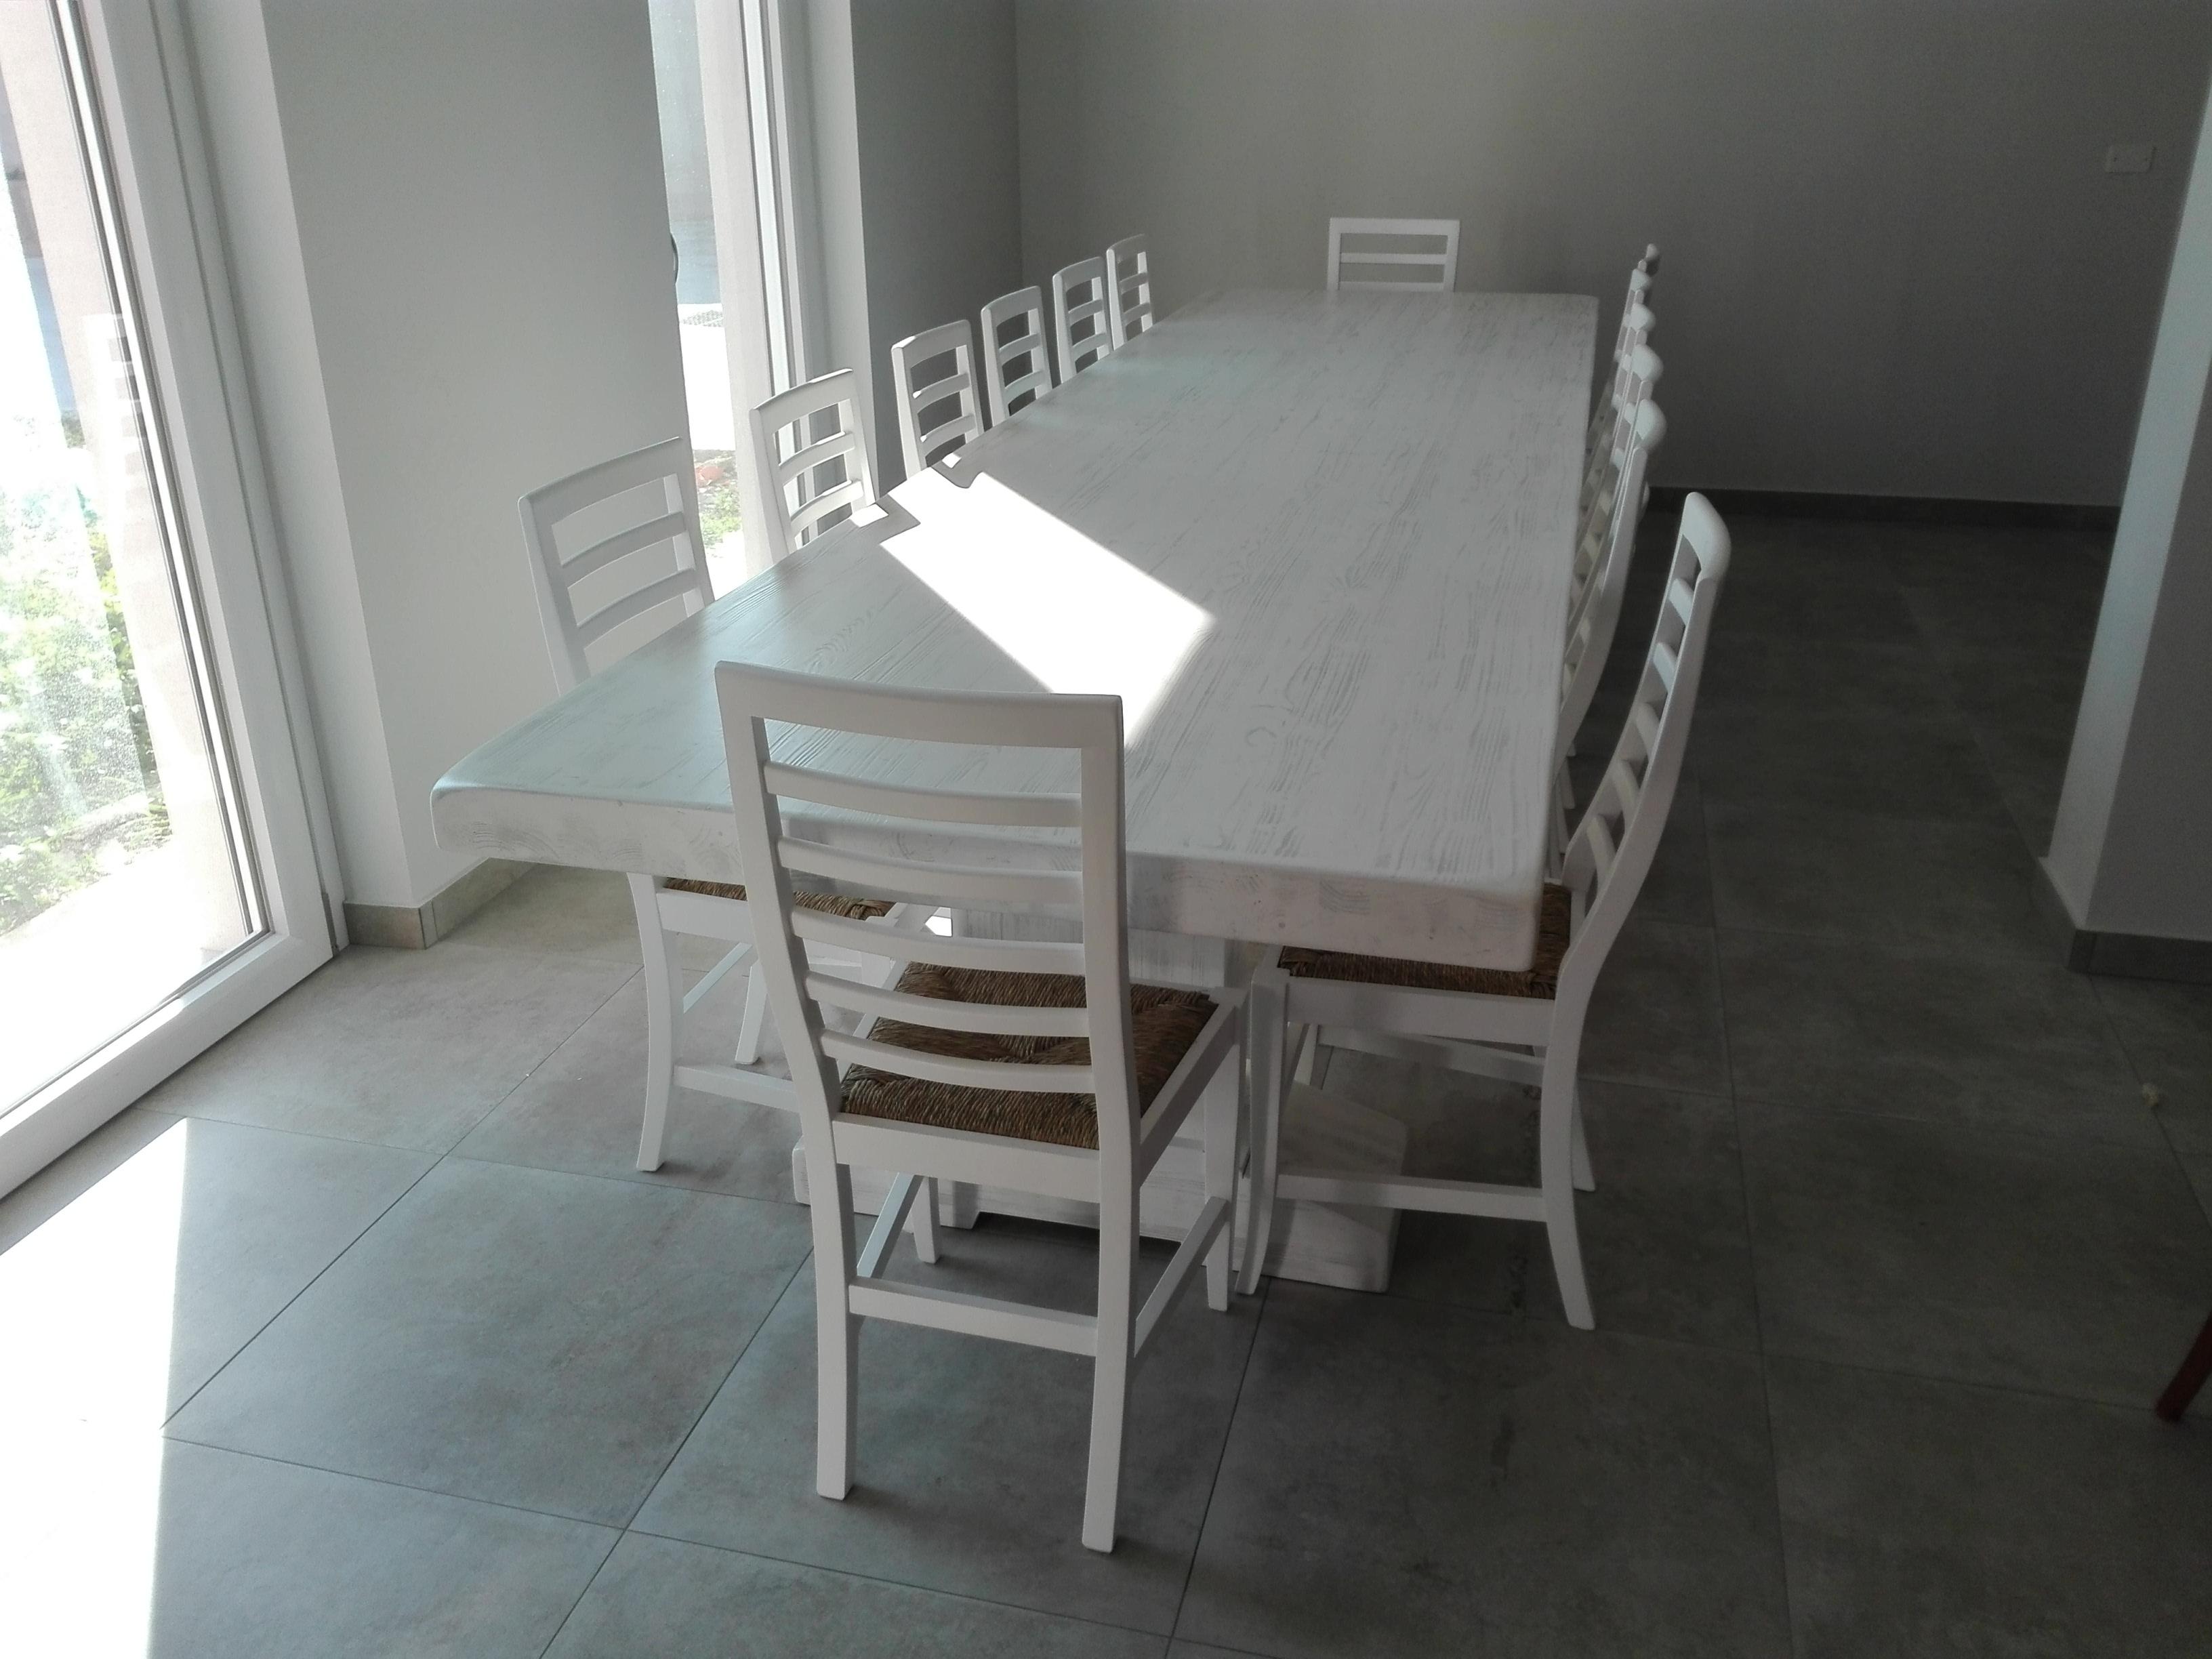 tavoli taverna 3 metri venezia ESCAPE='HTML'